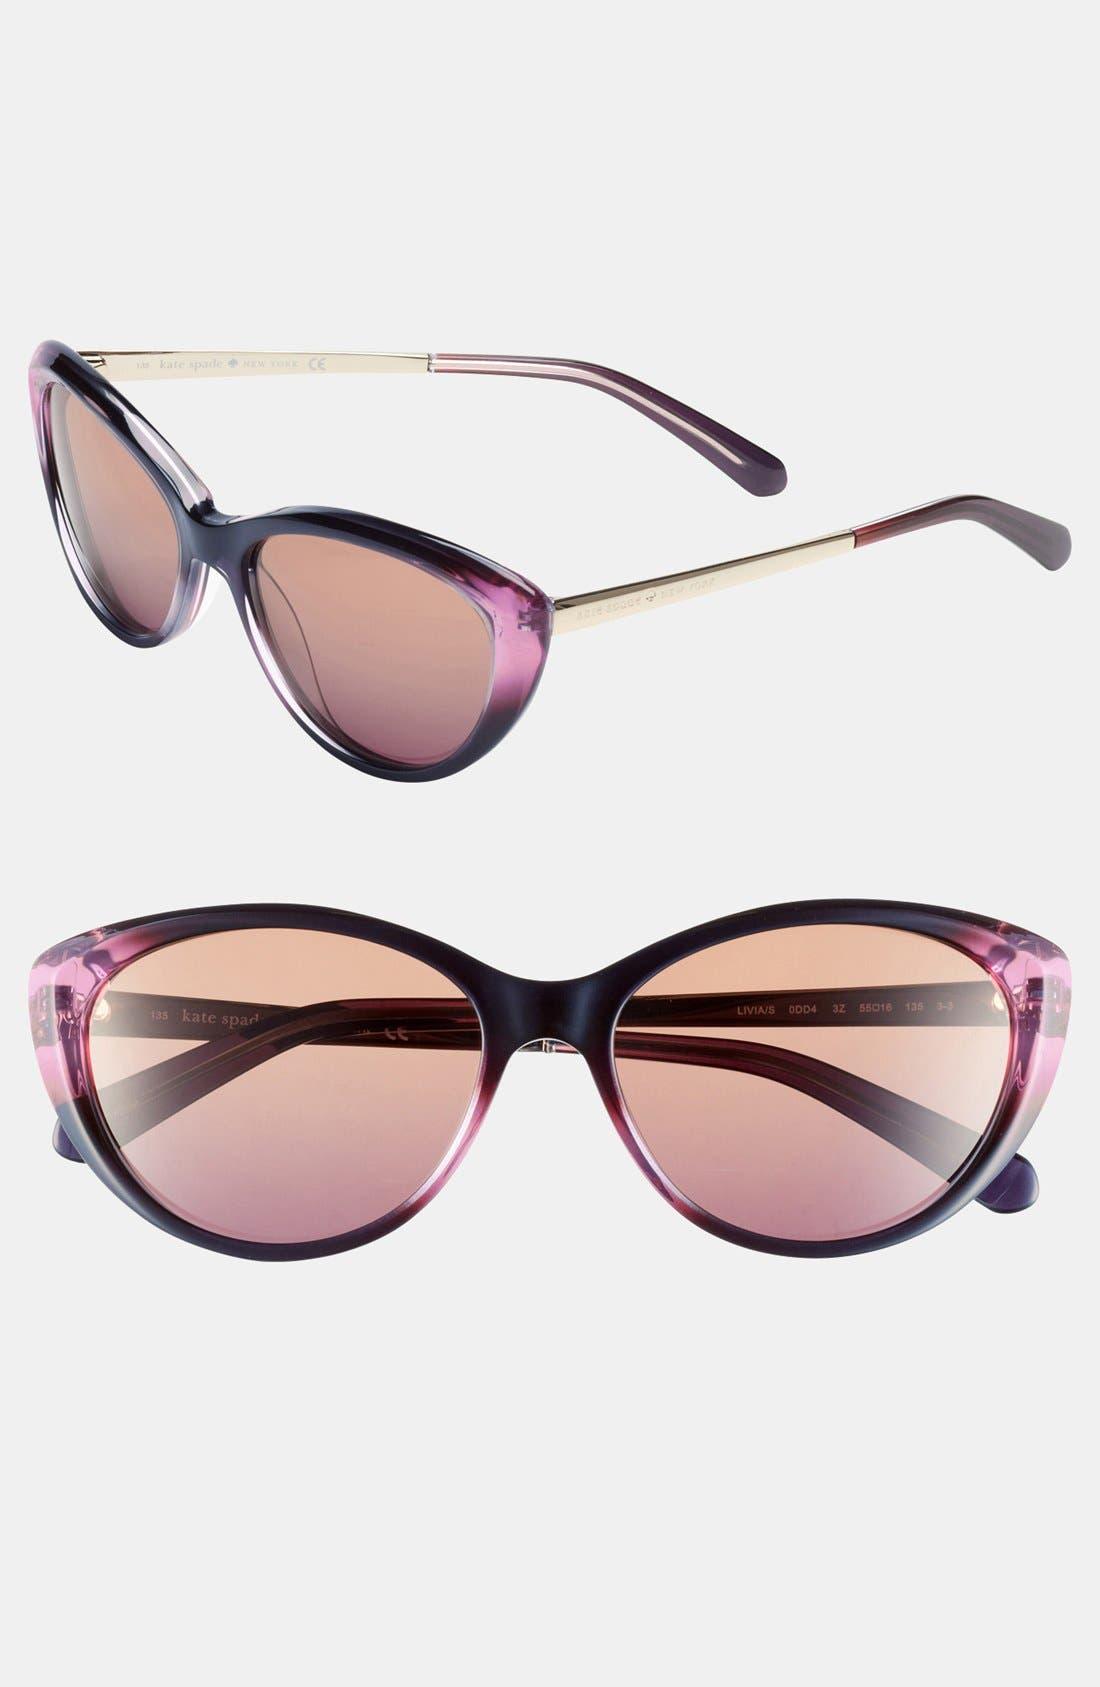 Alternate Image 1 Selected - kate spade new york 'livia' 55mm sunglasses